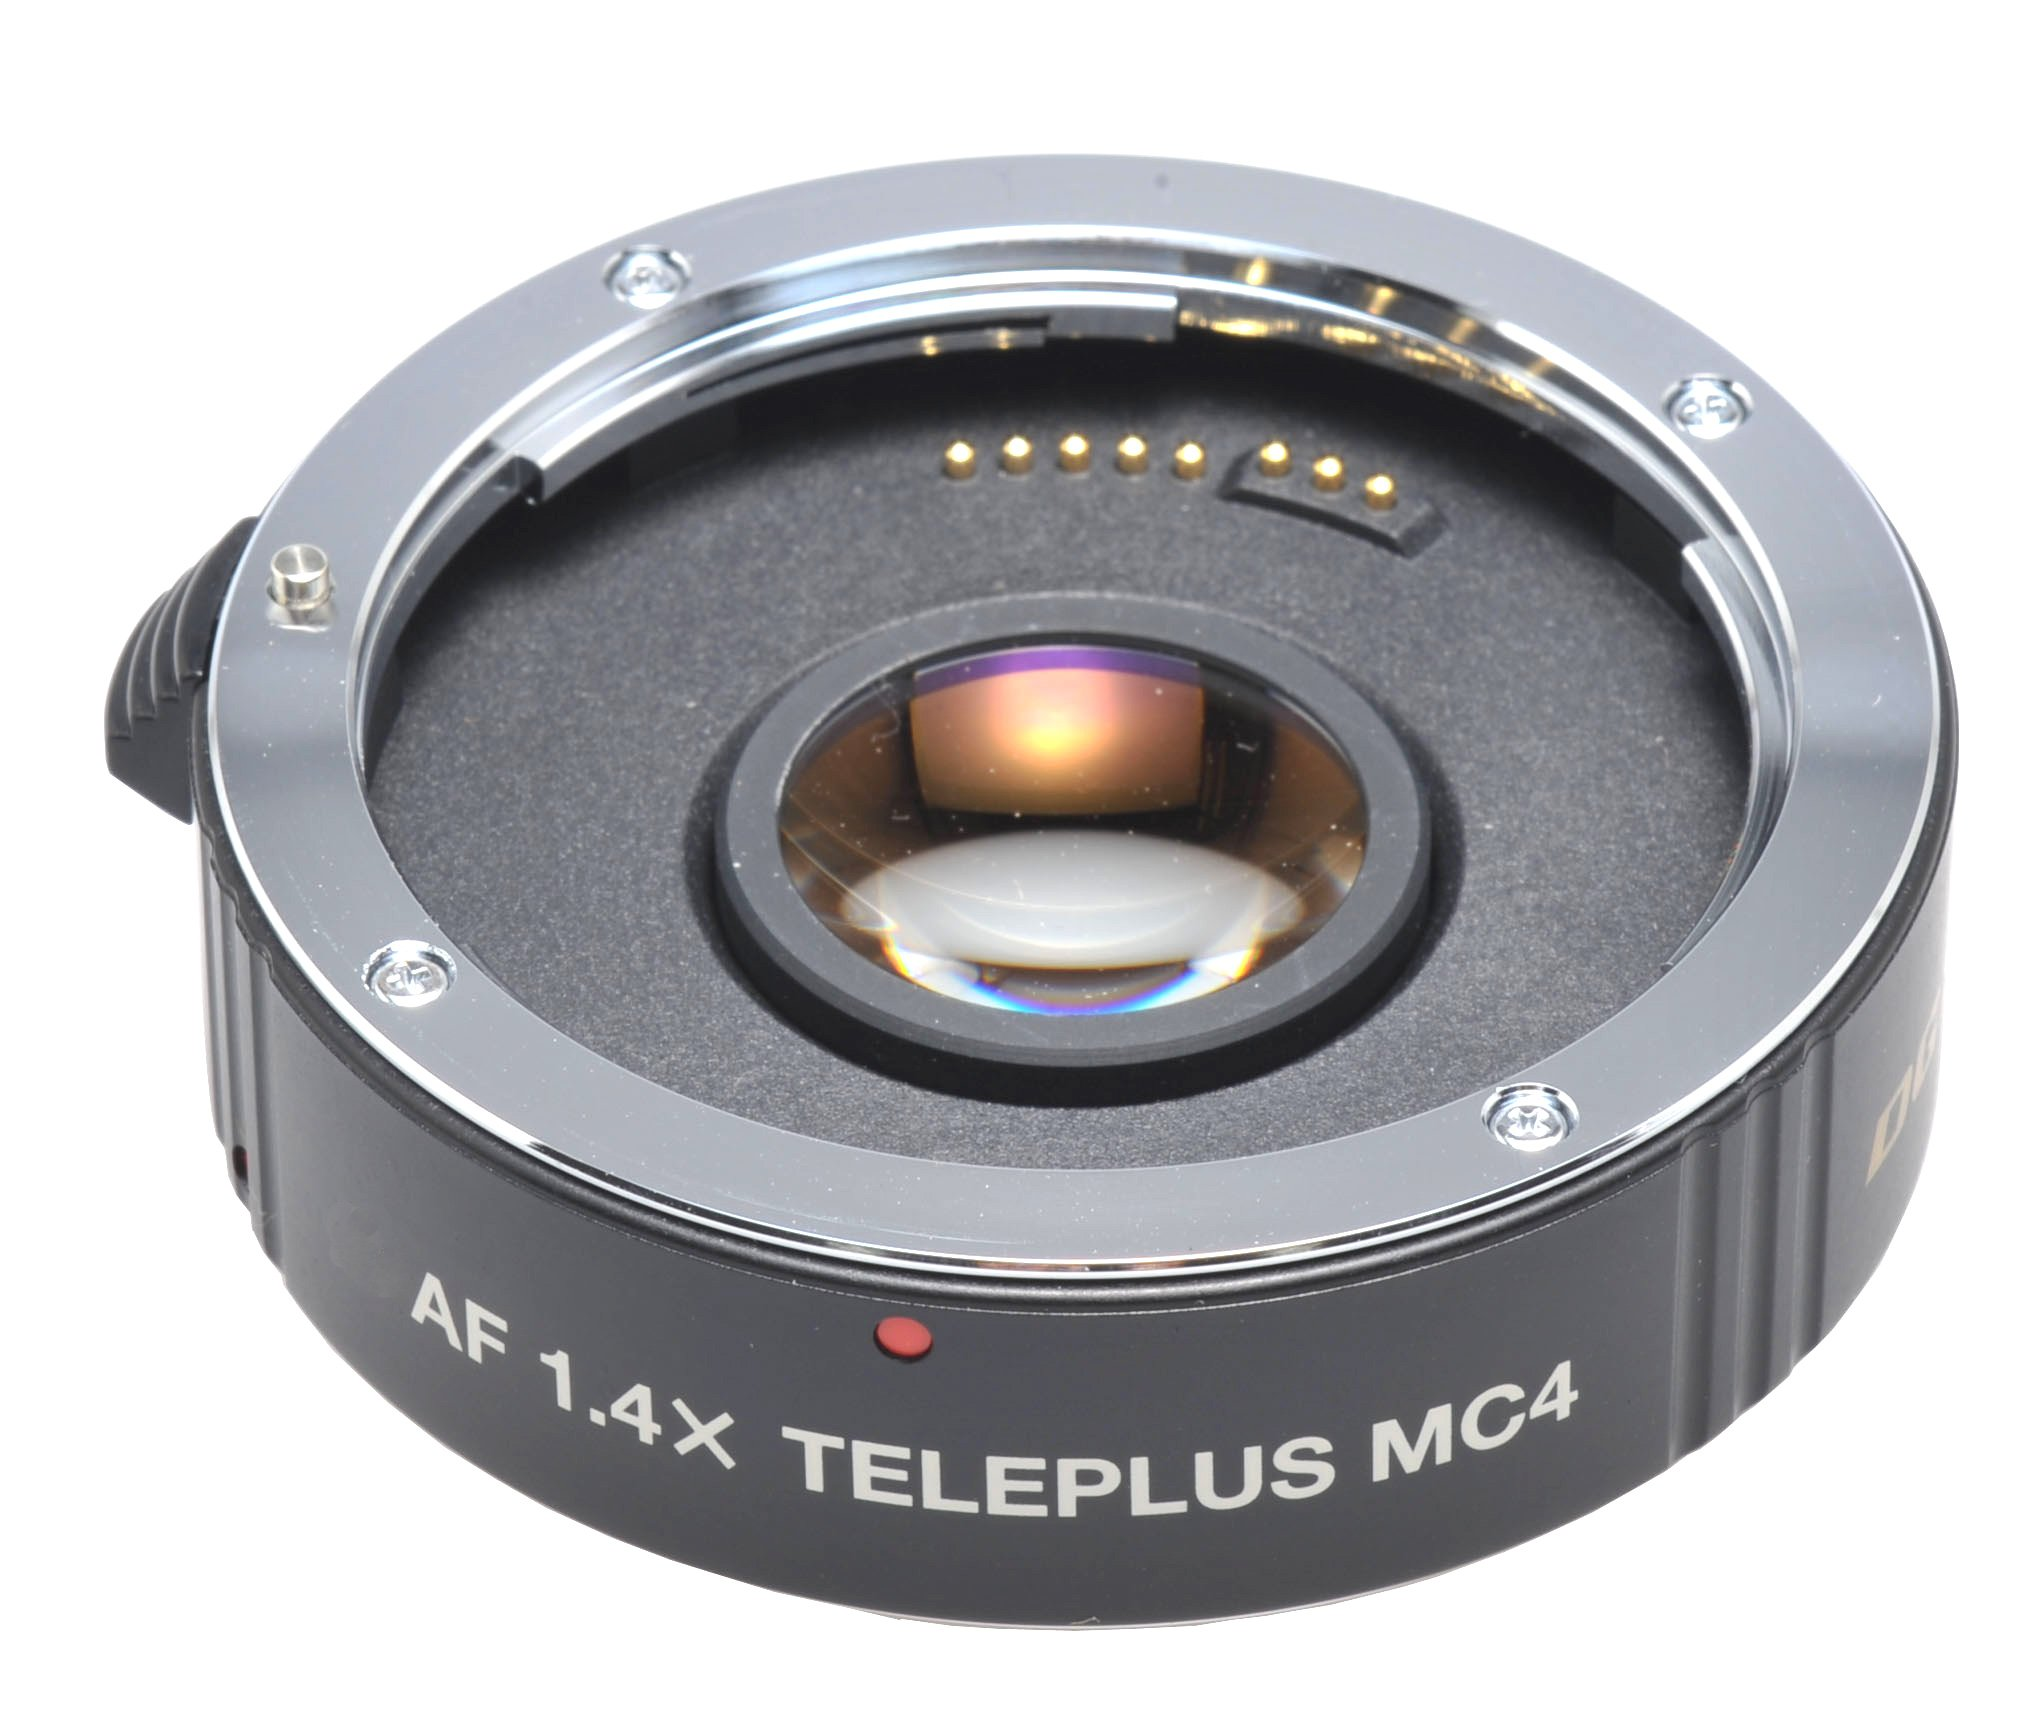 Kenko 1.4X Teleplus - 4 Element DGX Auto Focus for Canon EOS Digital SLRs by THK Photo Products Inc.